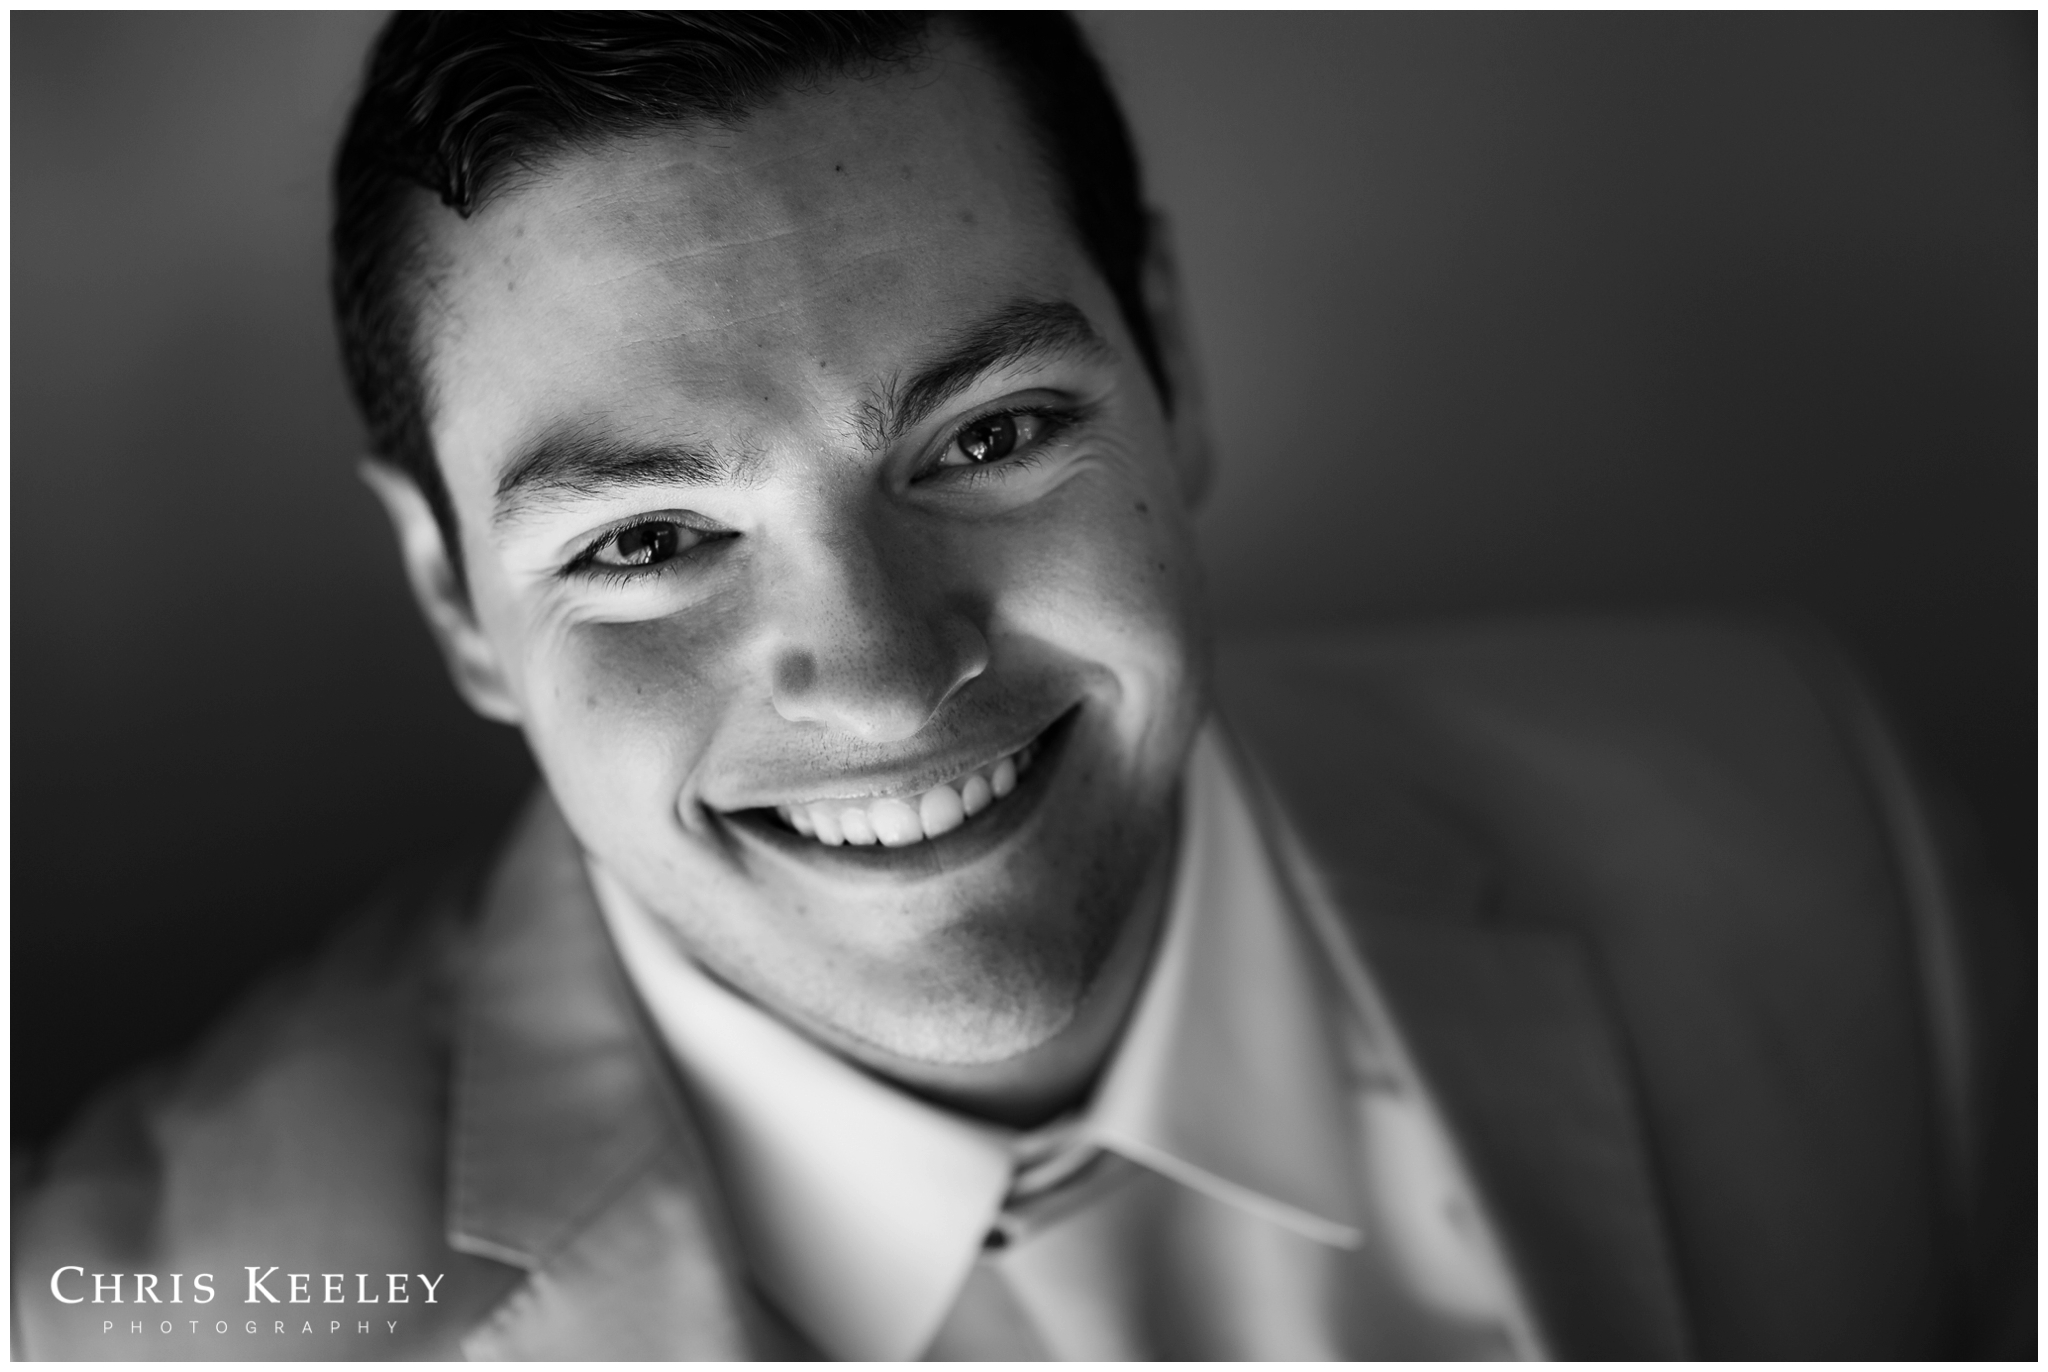 groom-portrait-headshot-black-and-white.jpg